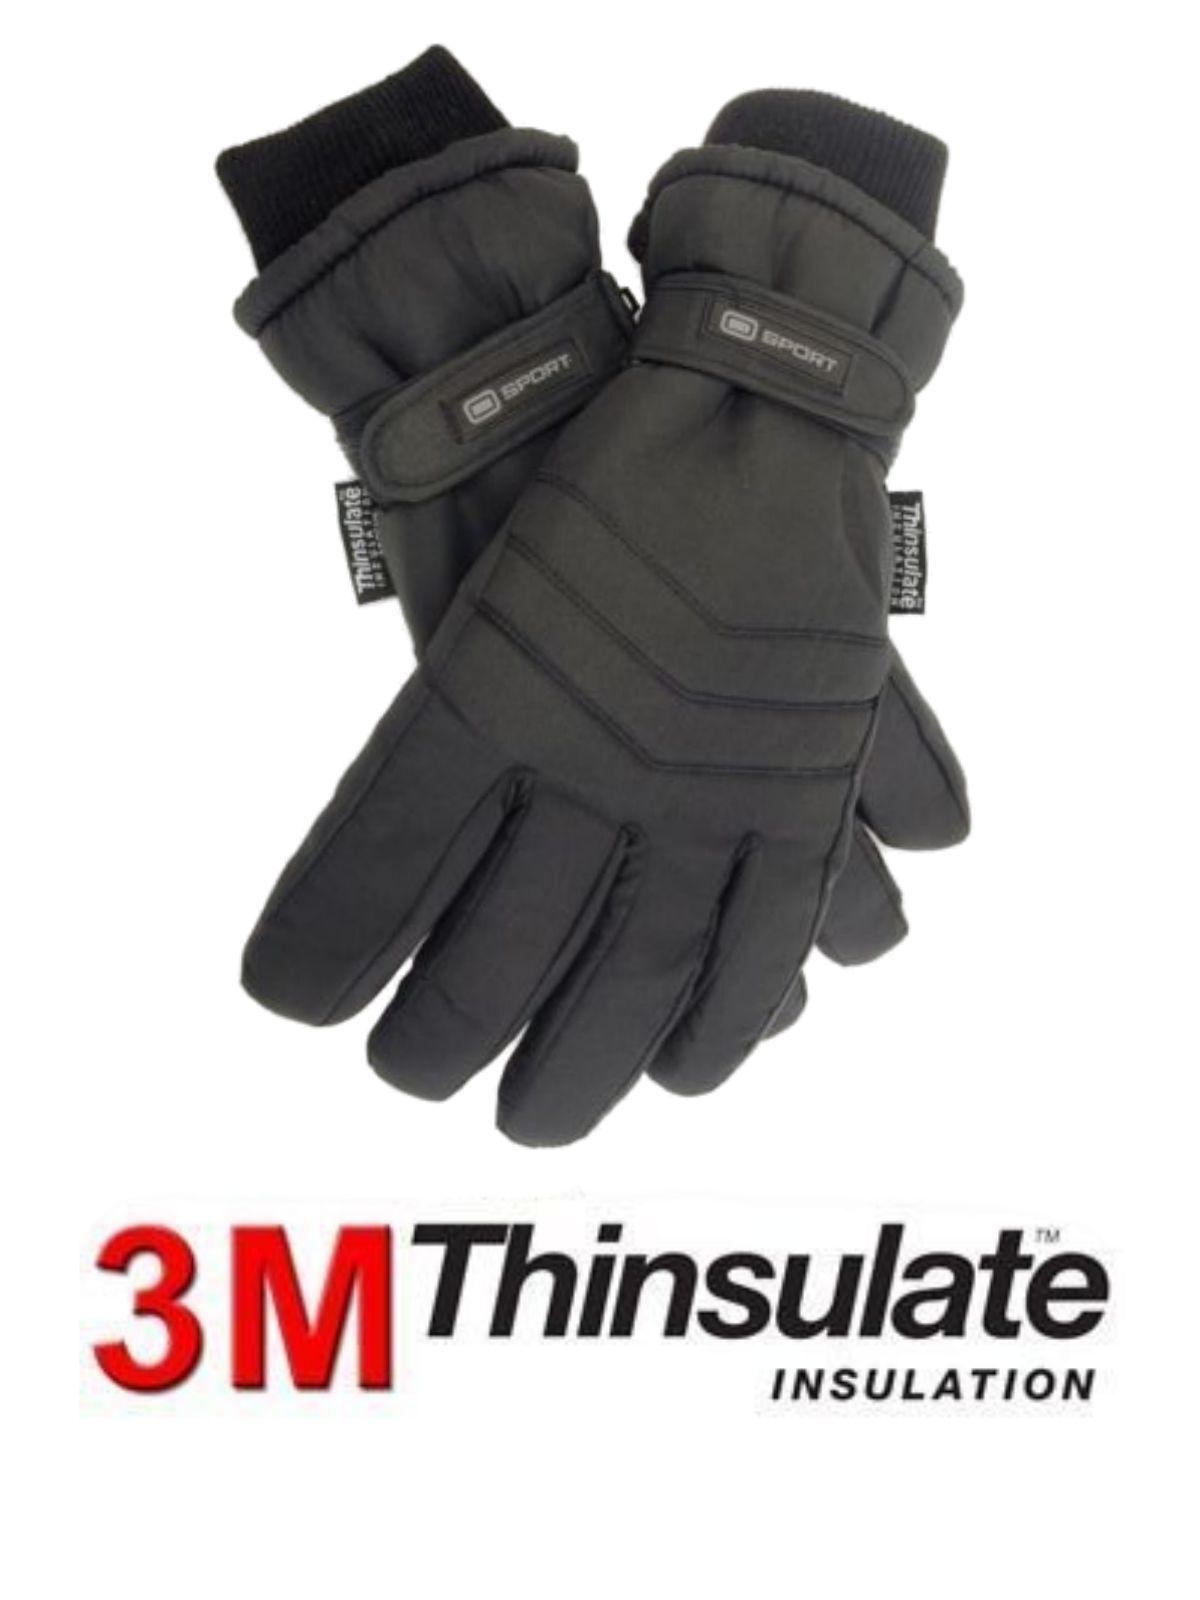 Disney Frozen Elsa Gloves 8-10 years Girls H/&M 3M Thinsulate BNWT Water resist